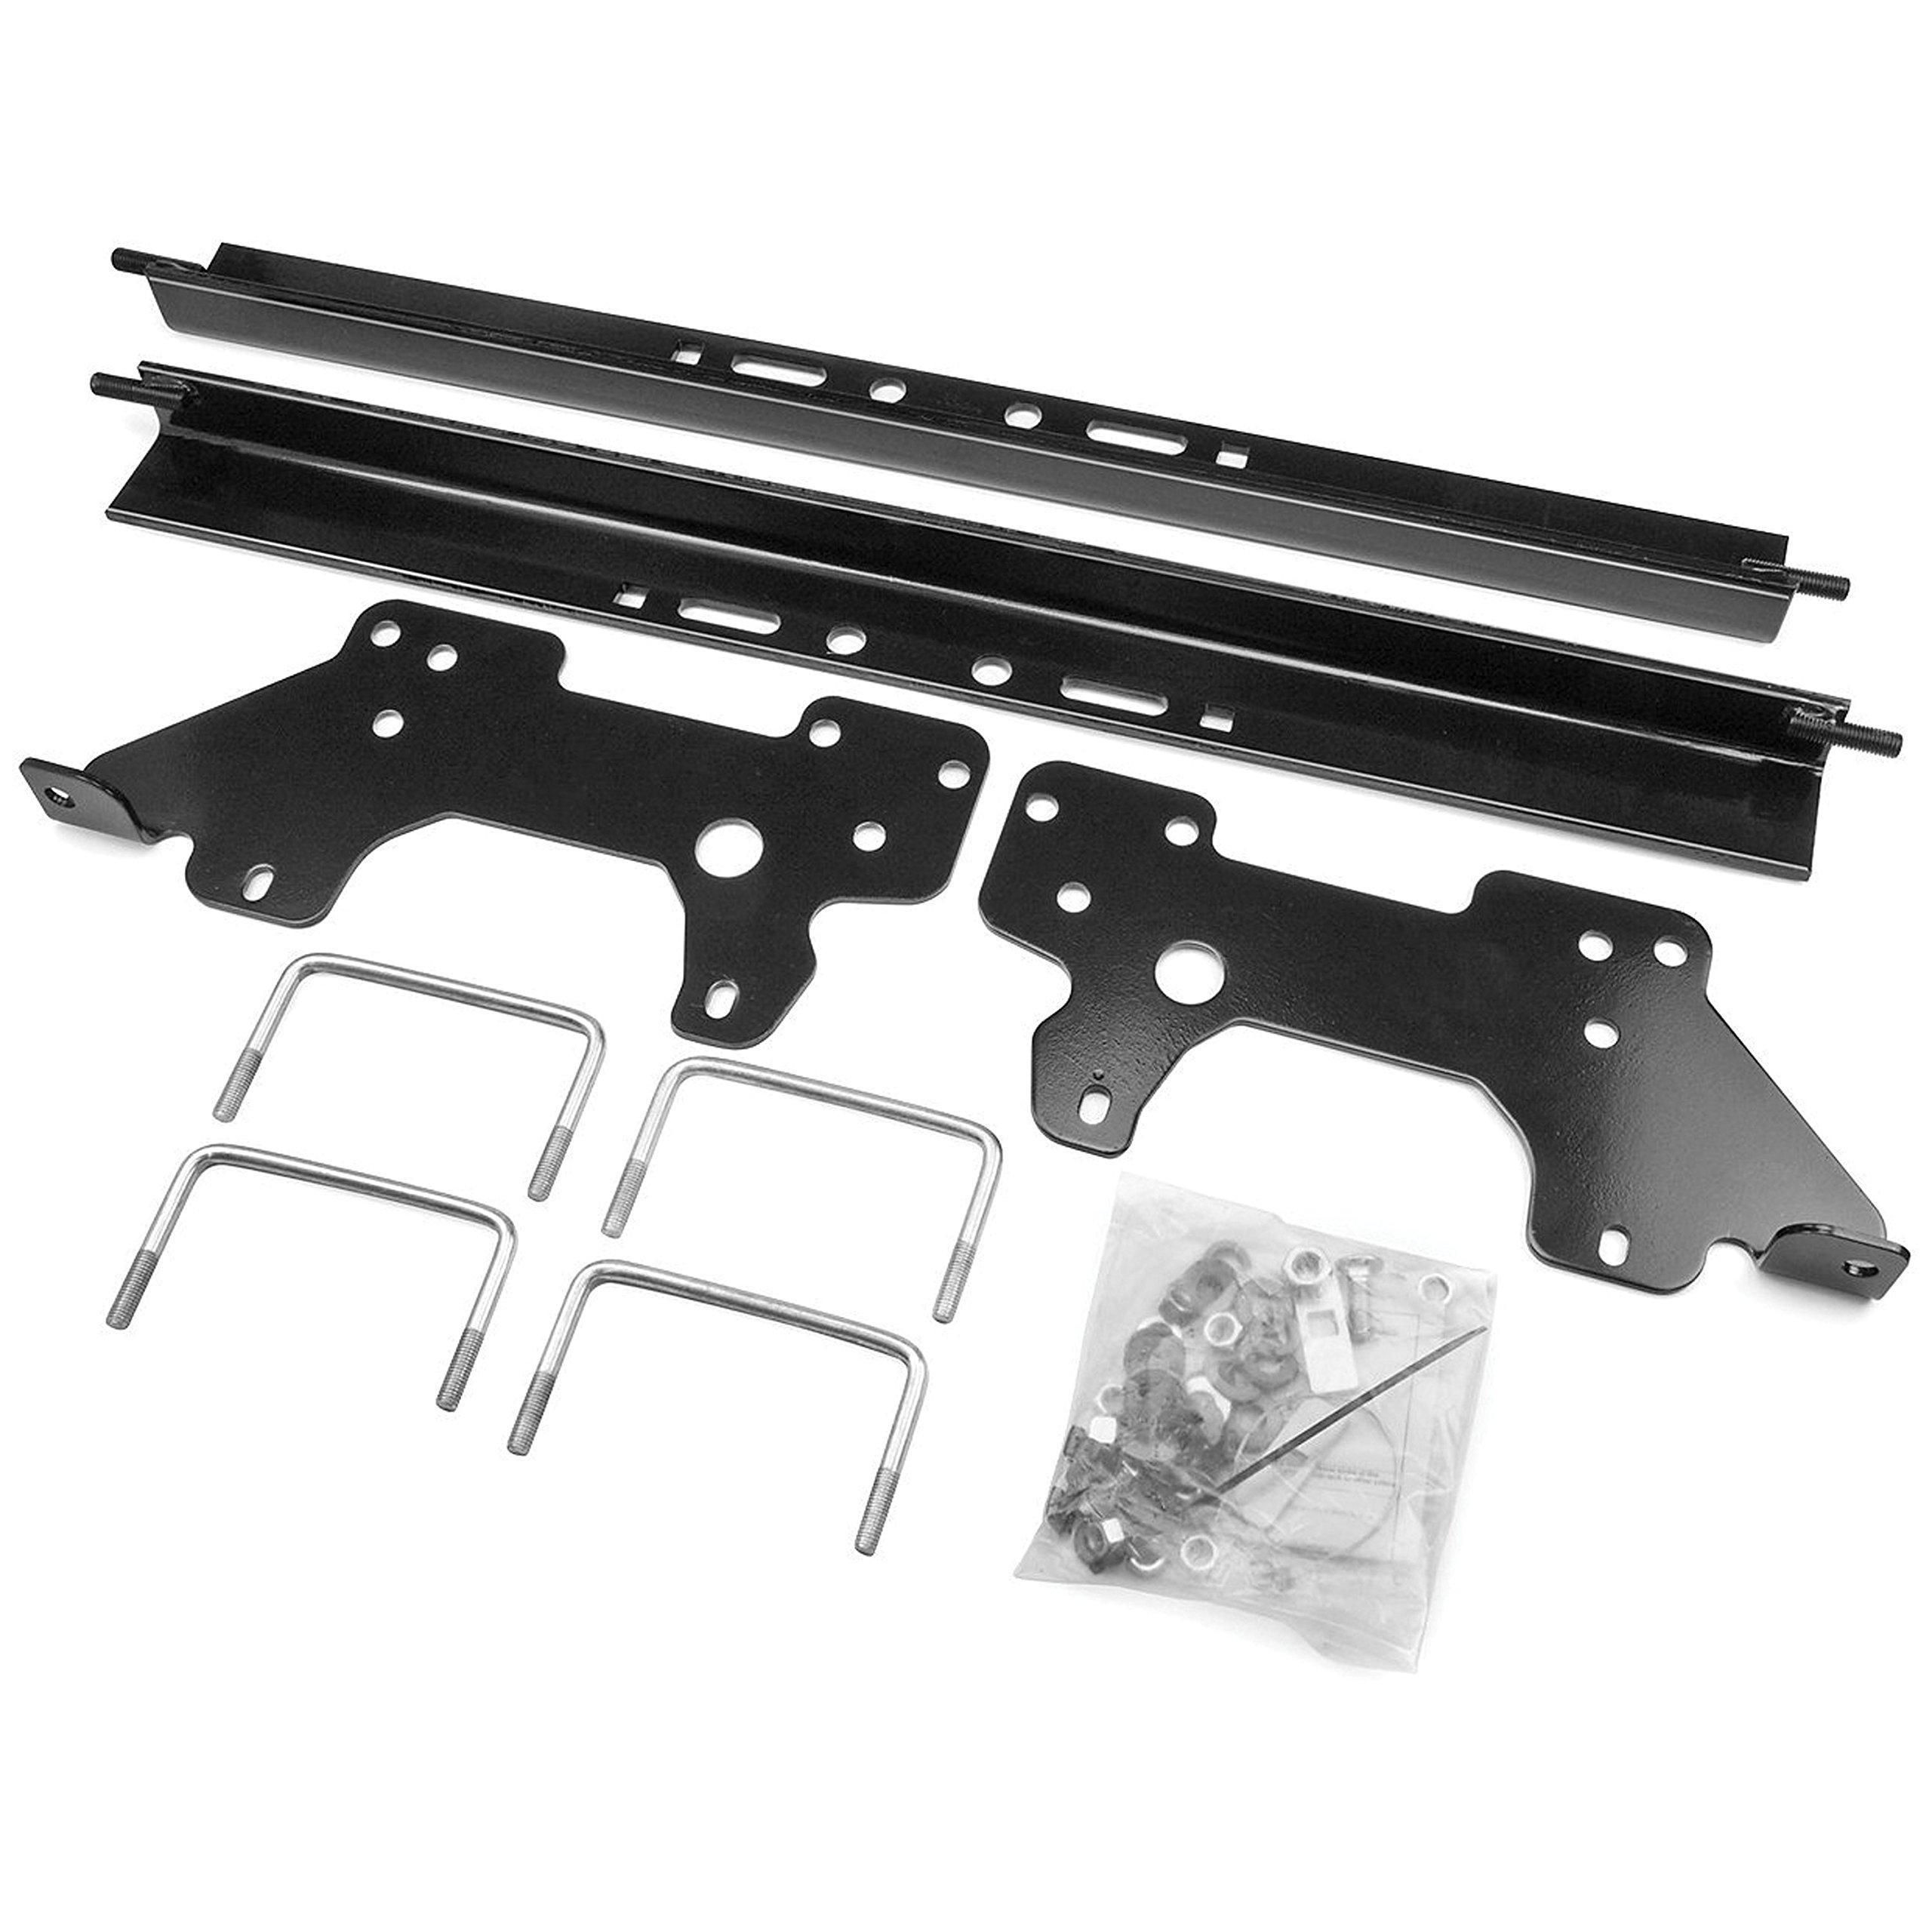 Draw-Tite 4435 Gooseneck Rail Kit for Dodge/Ram